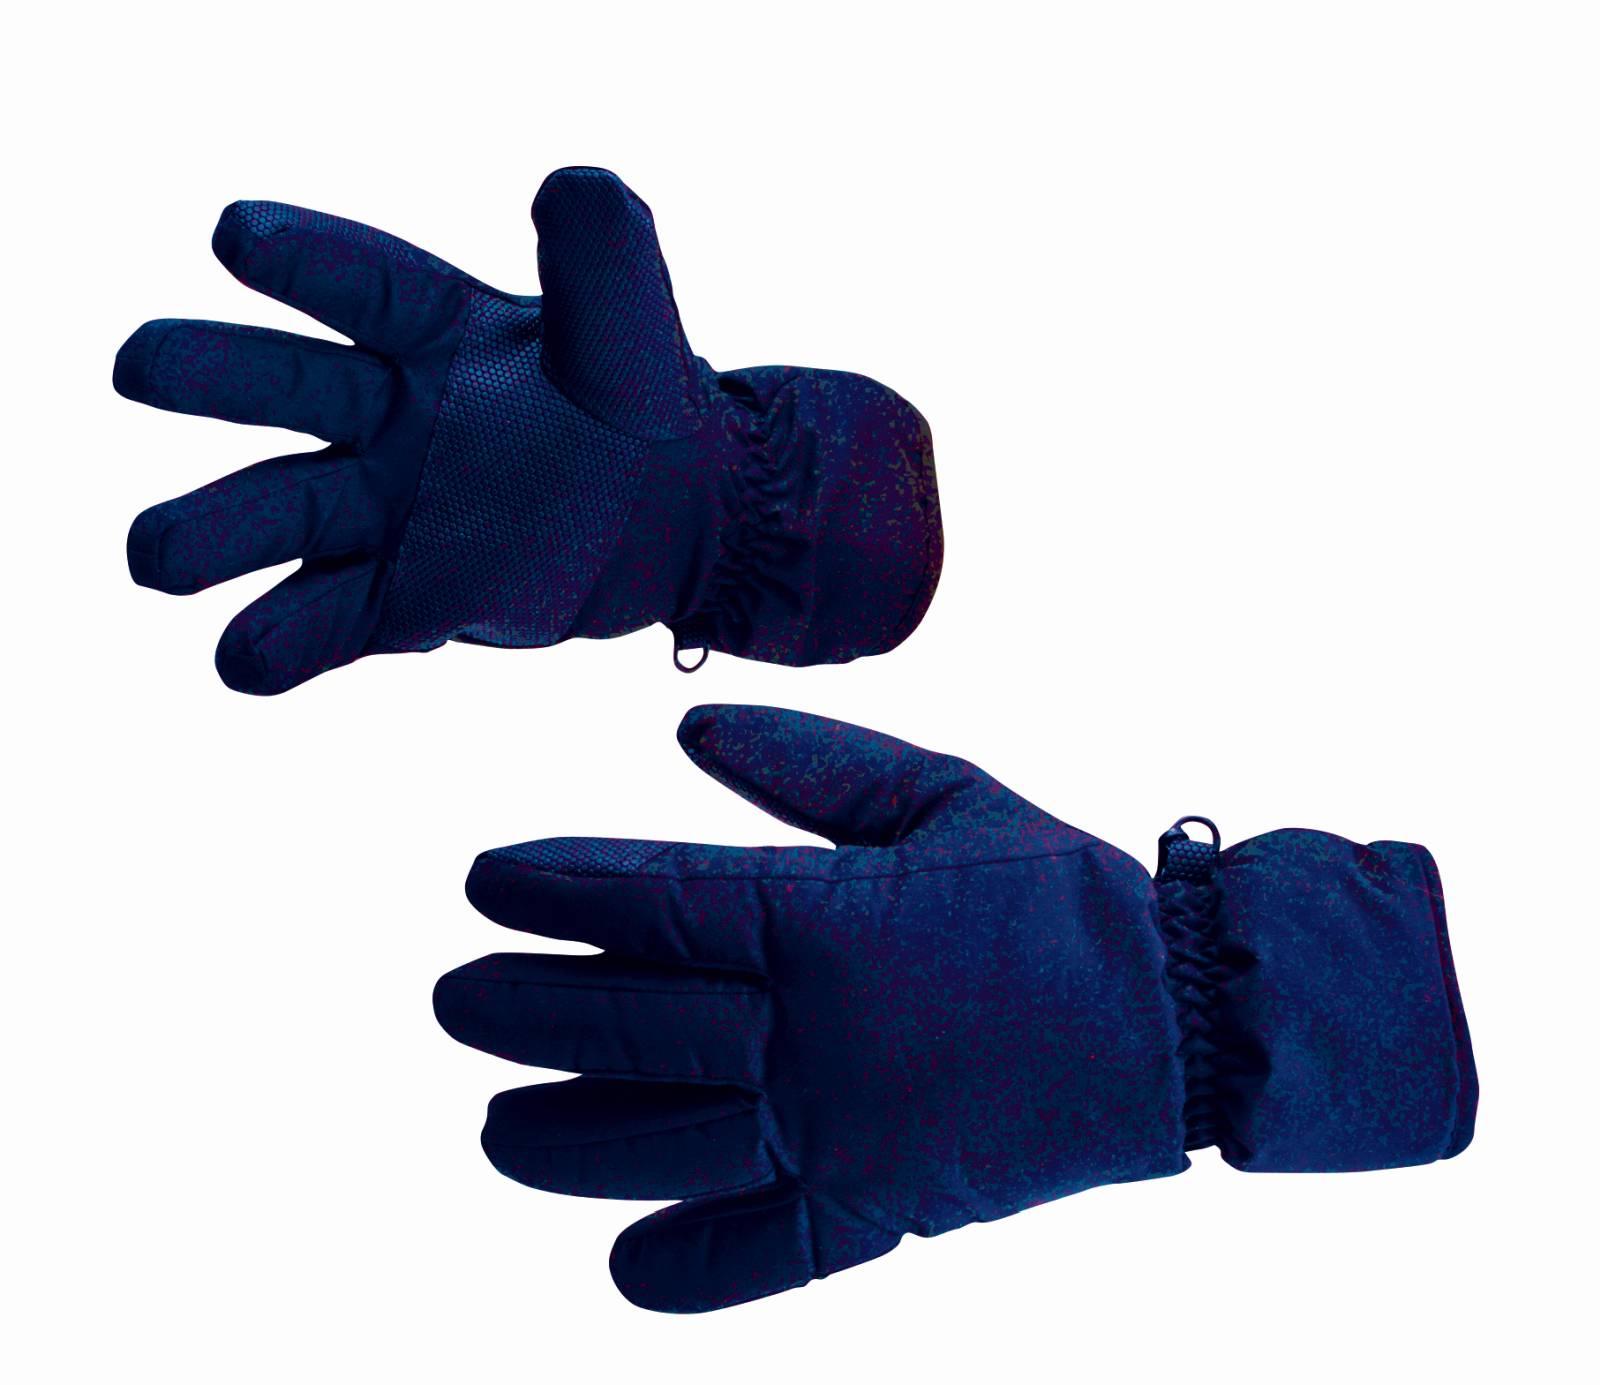 Portwest Handschoenen GL10 marineblauw(NA)